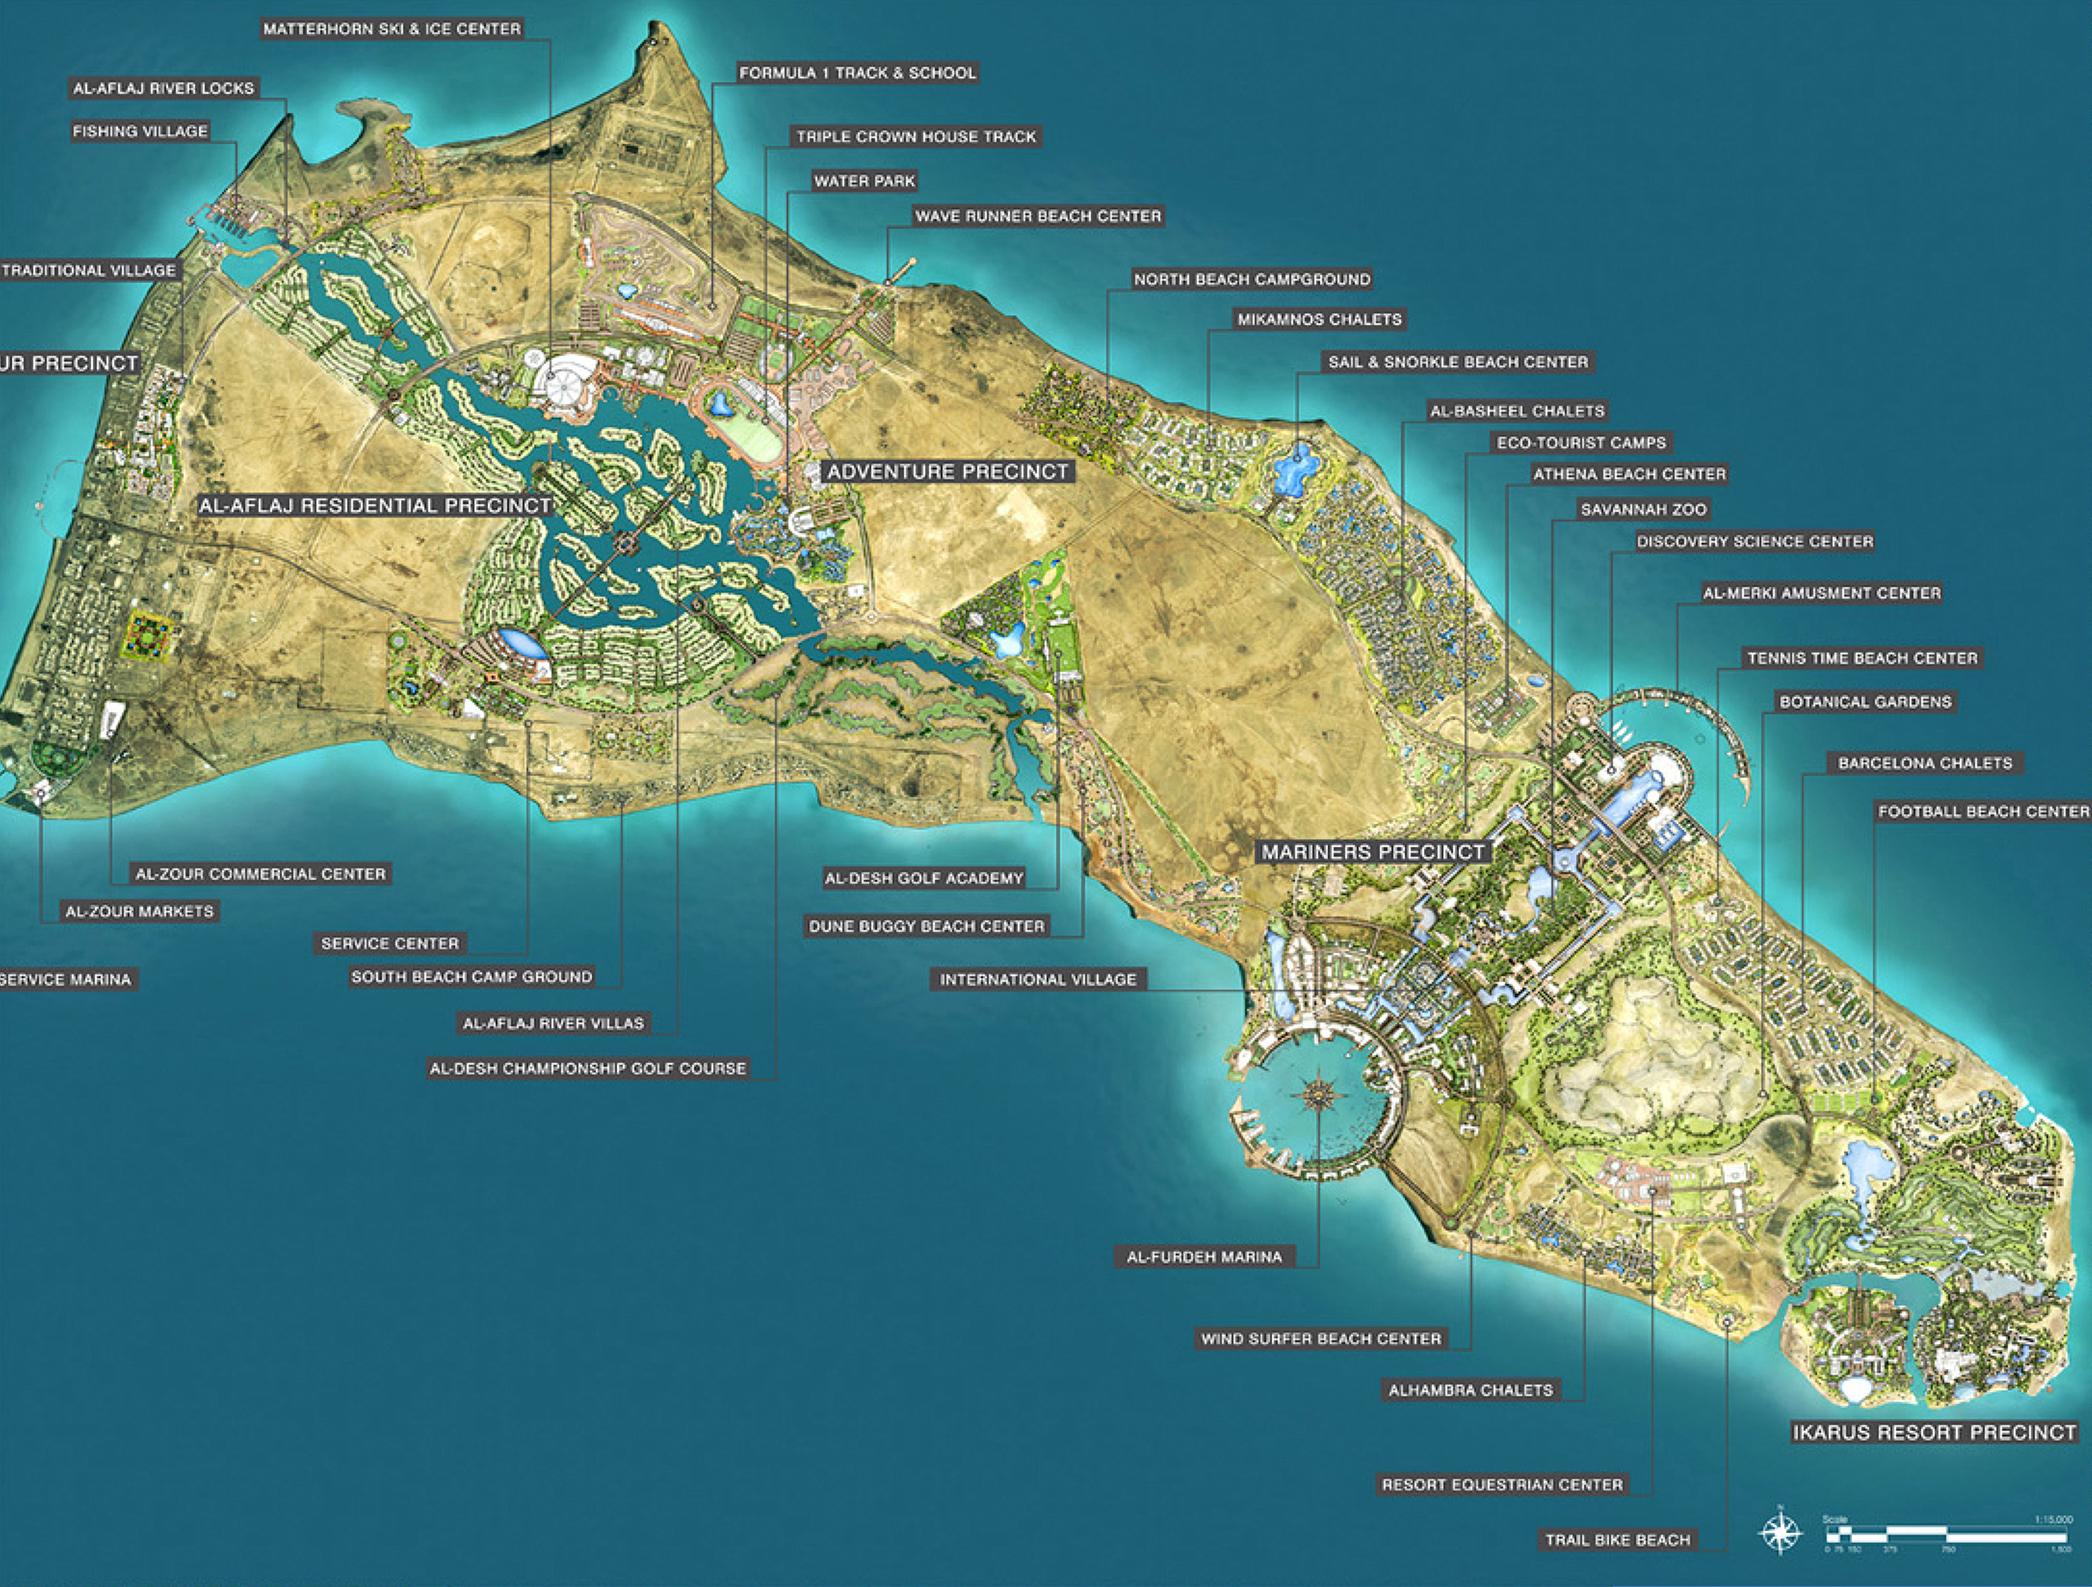 FAILAKA ISLAND